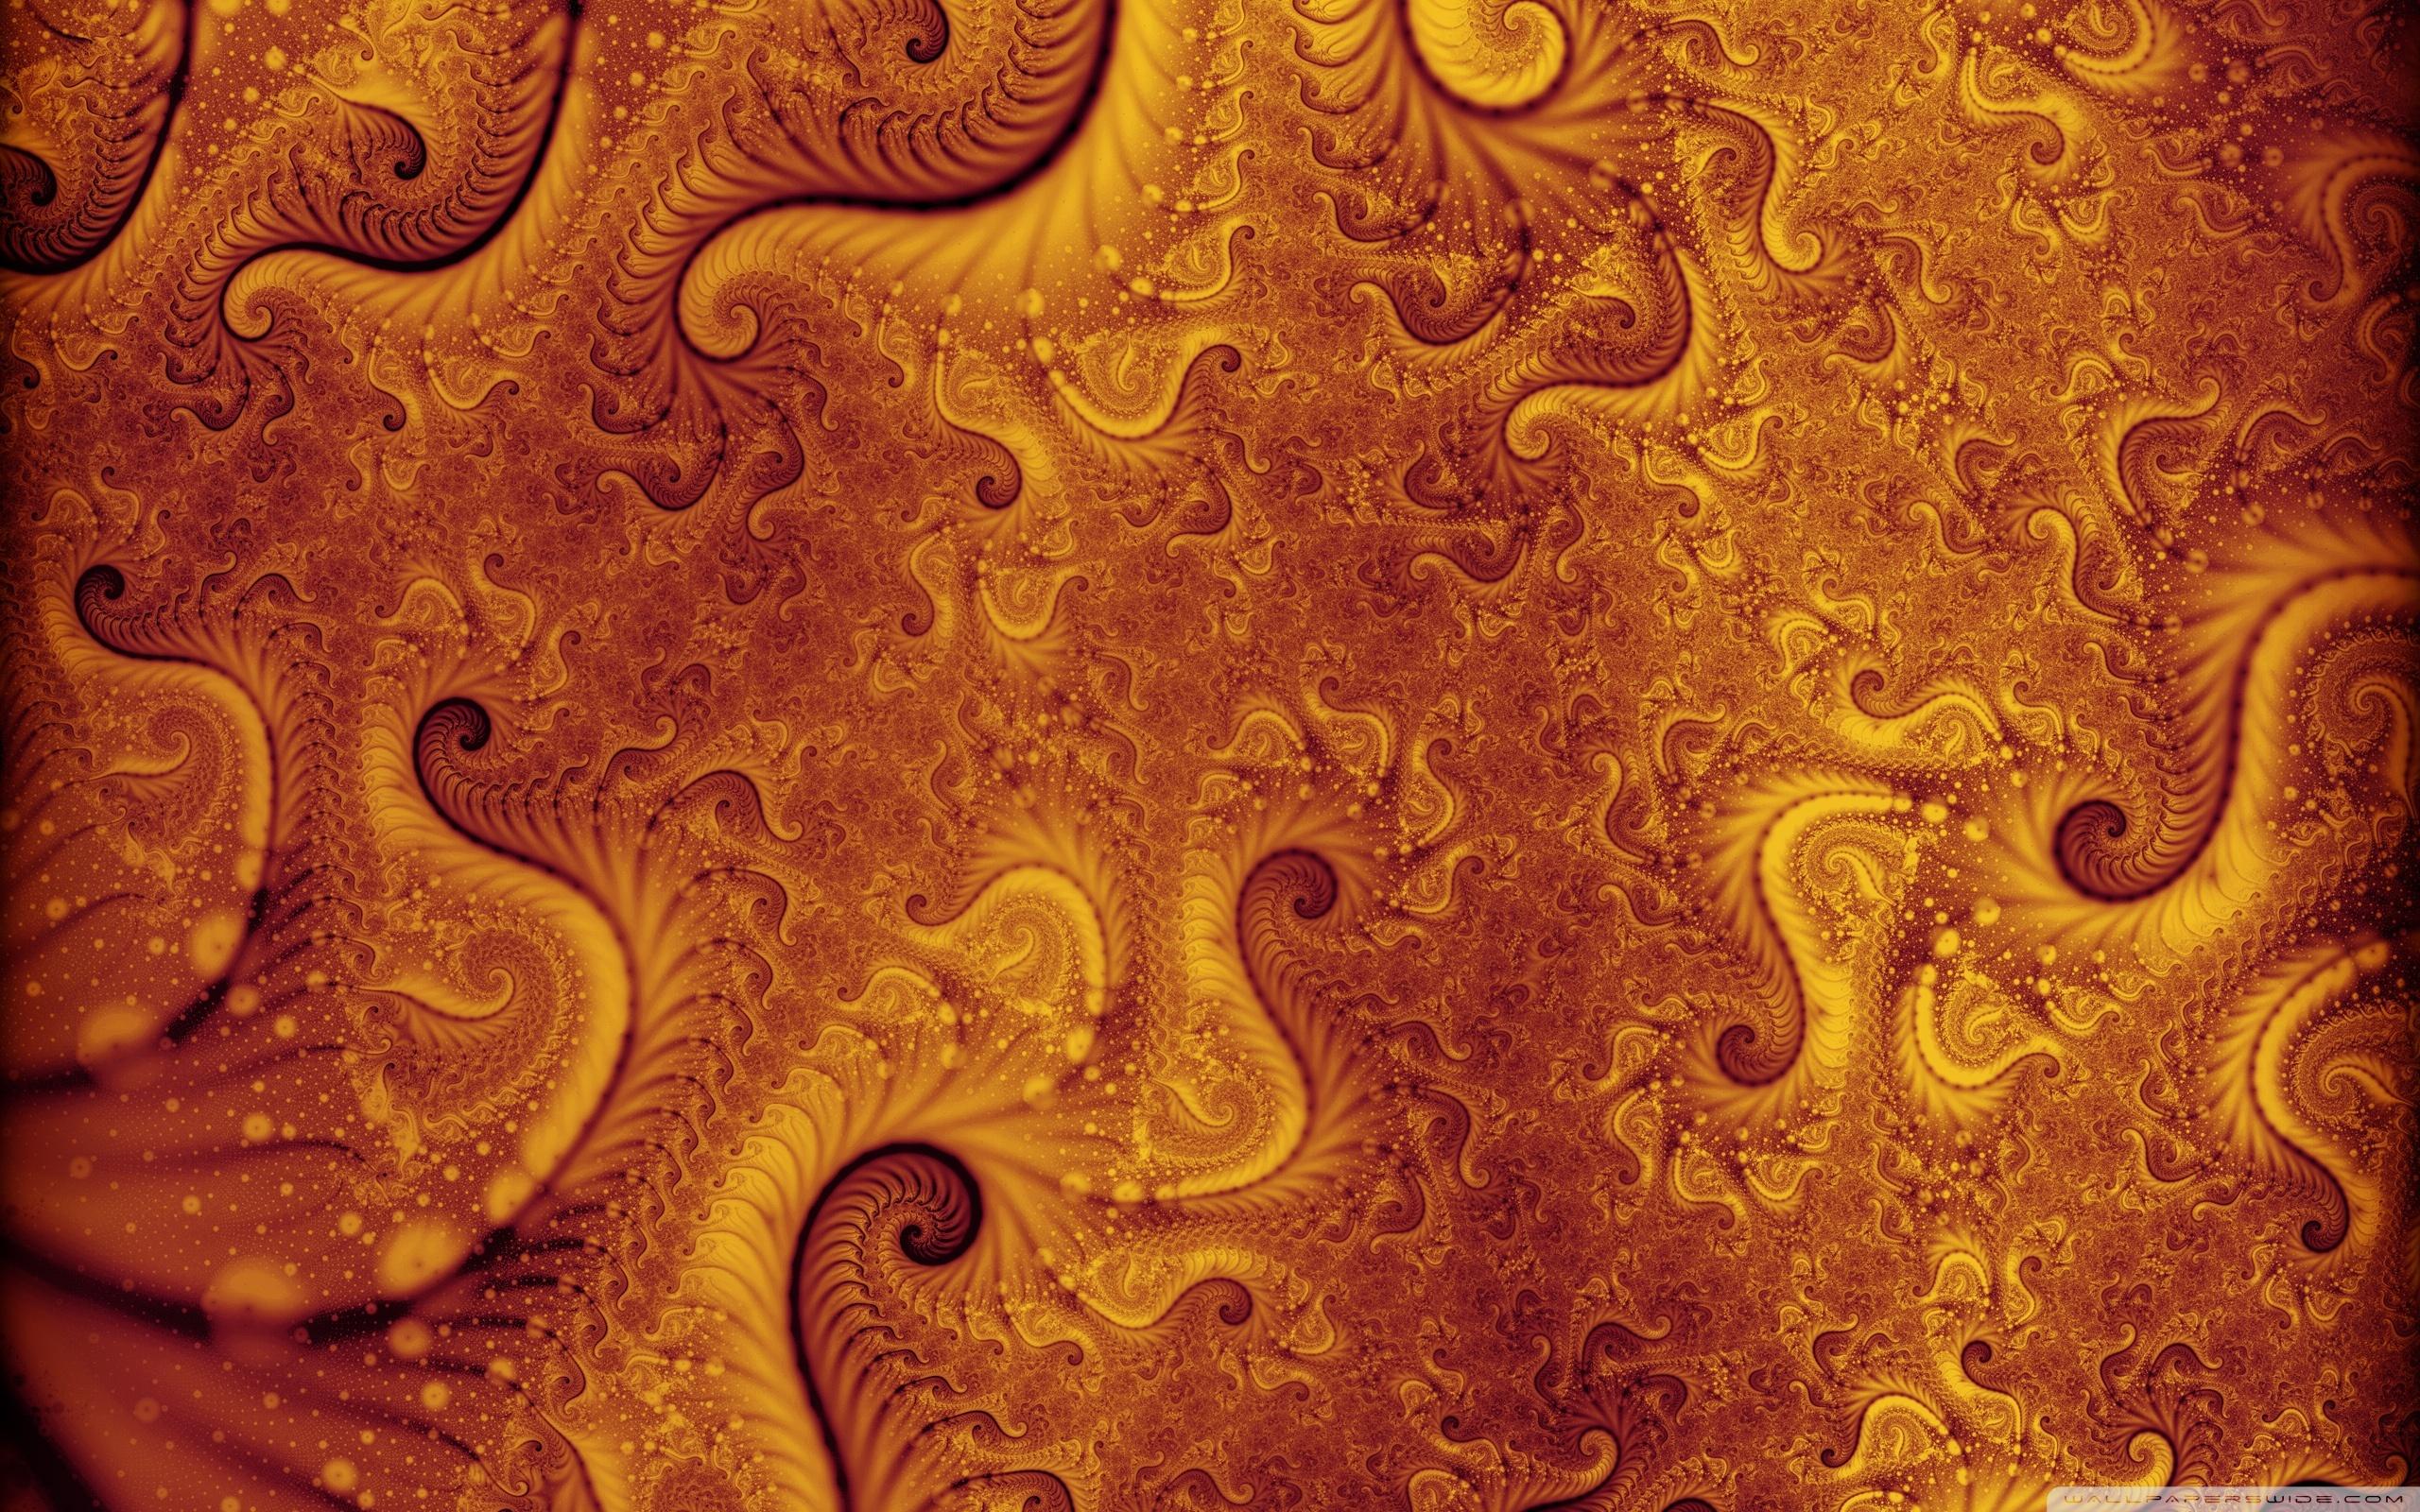 Orange Fractal Wallpaper